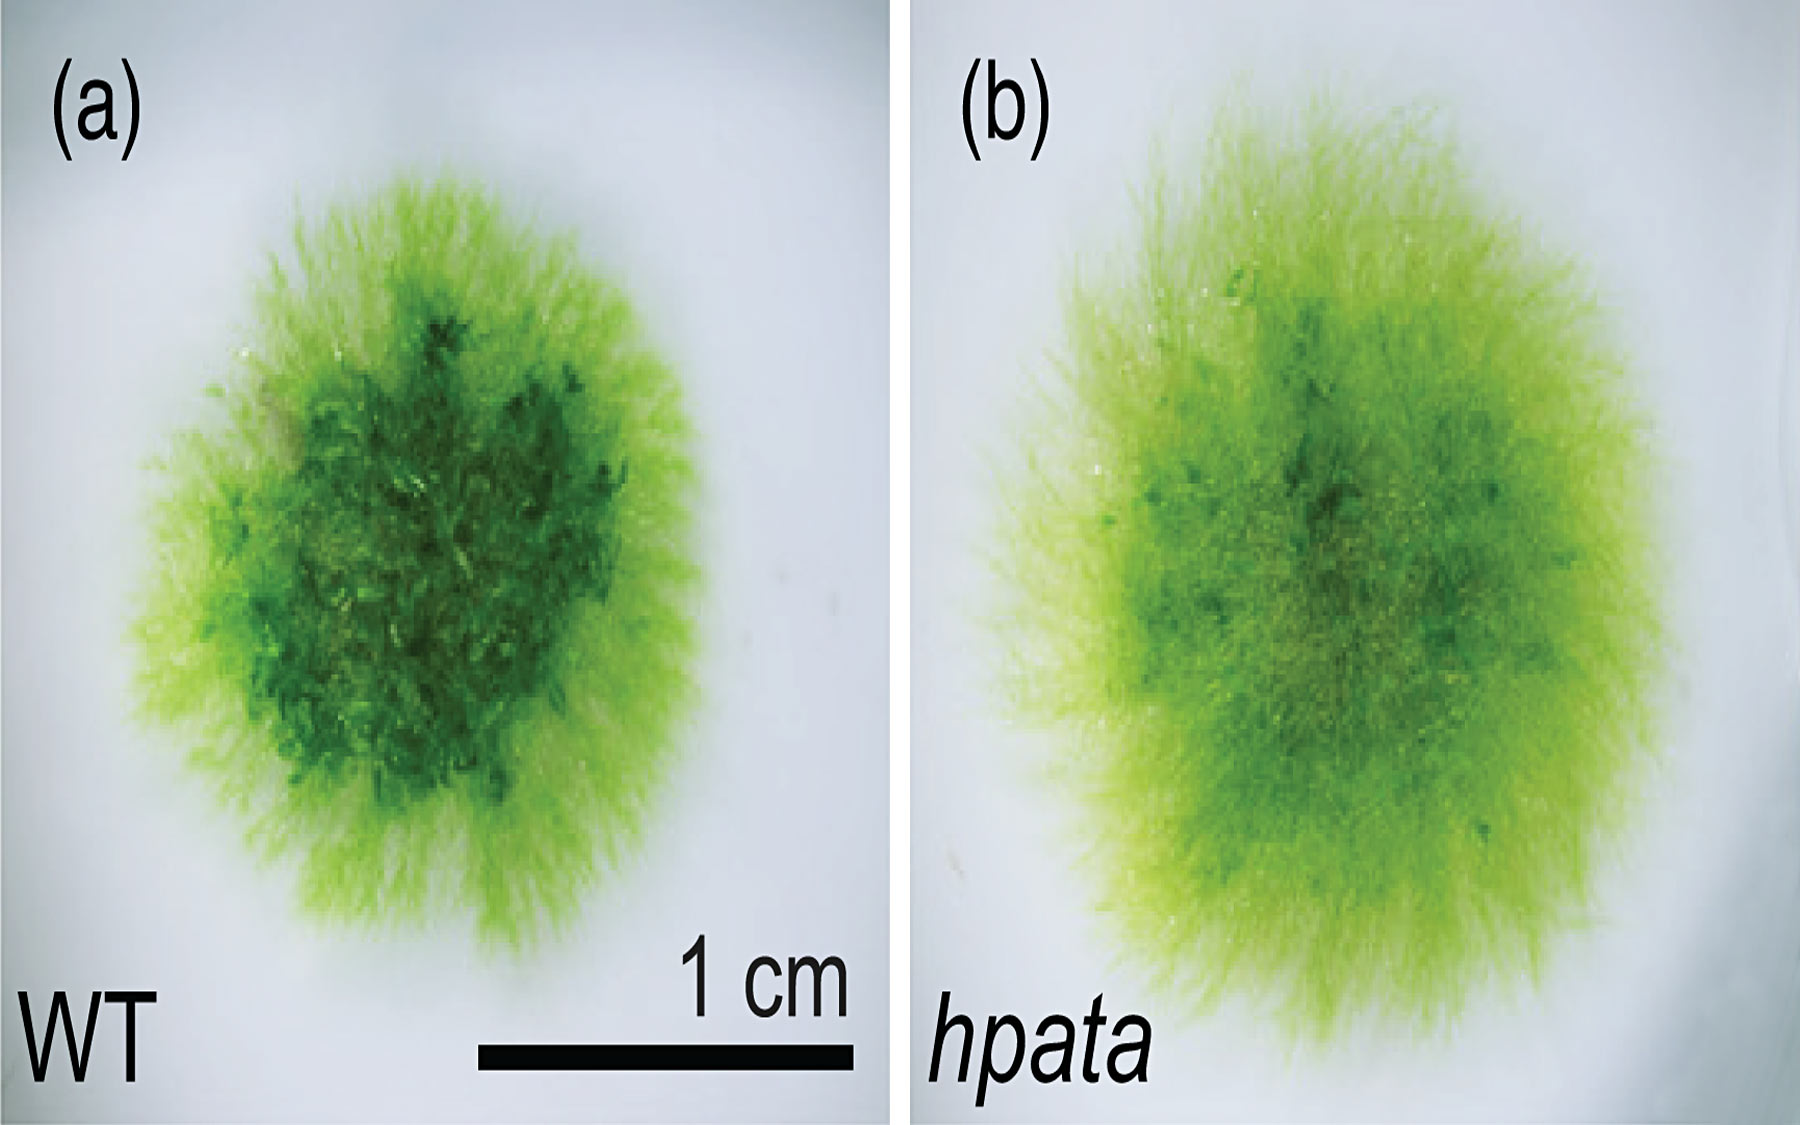 moss samples